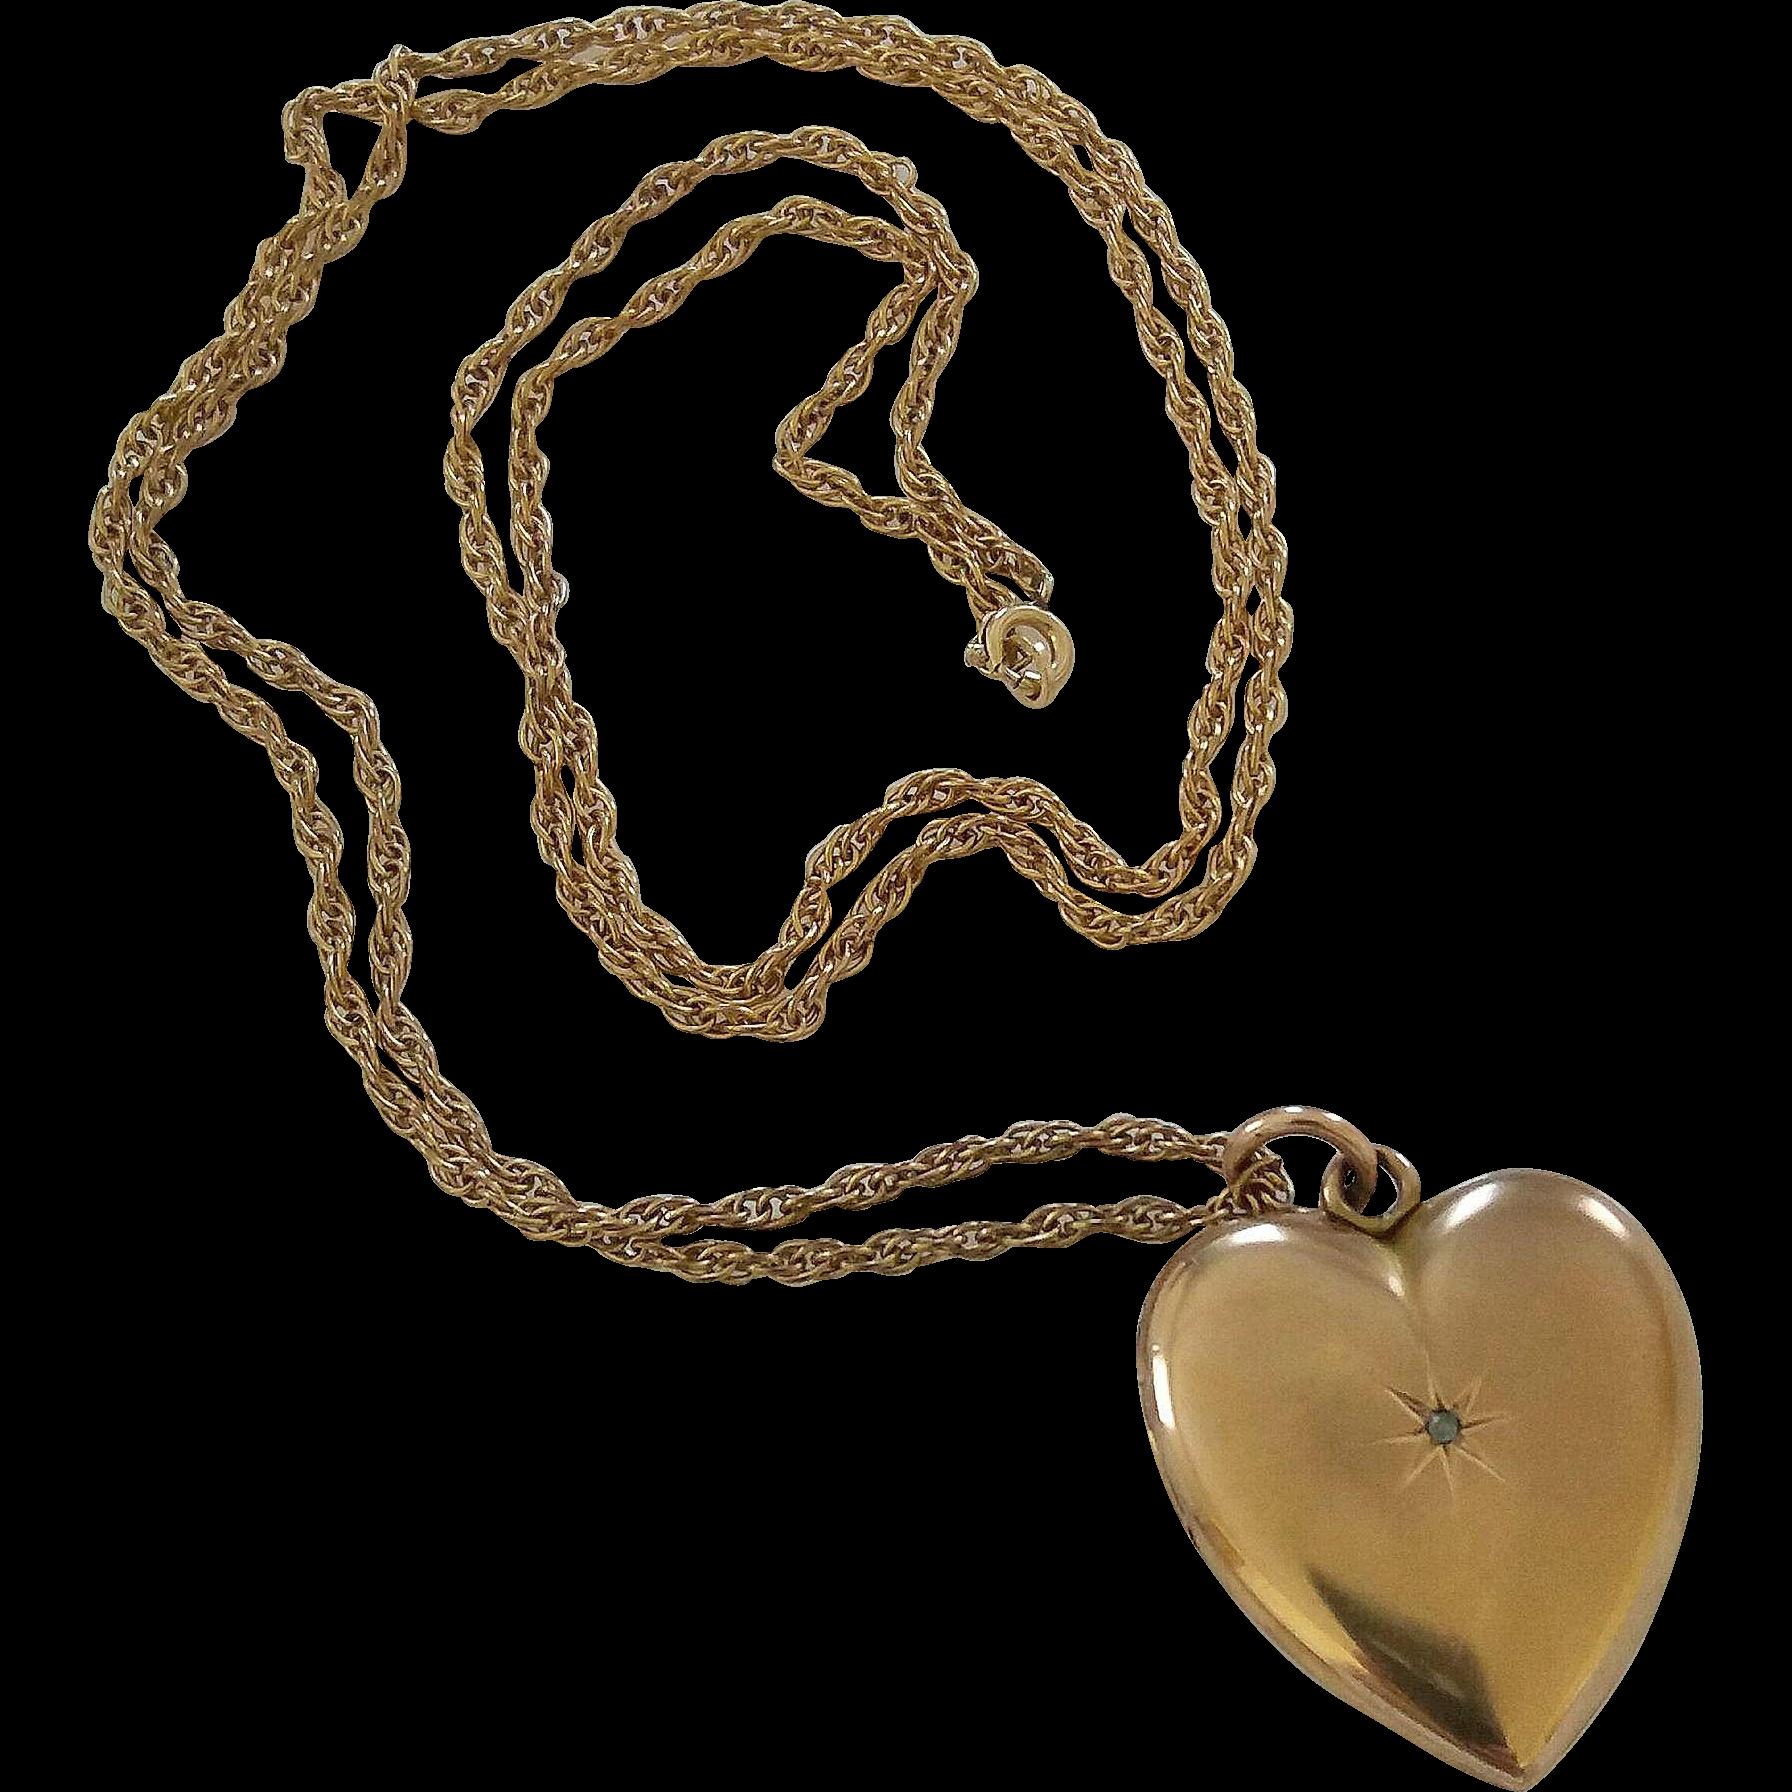 Heart locket clipart vector library library Heart Pendant PNG Clipart   PNG Mart vector library library